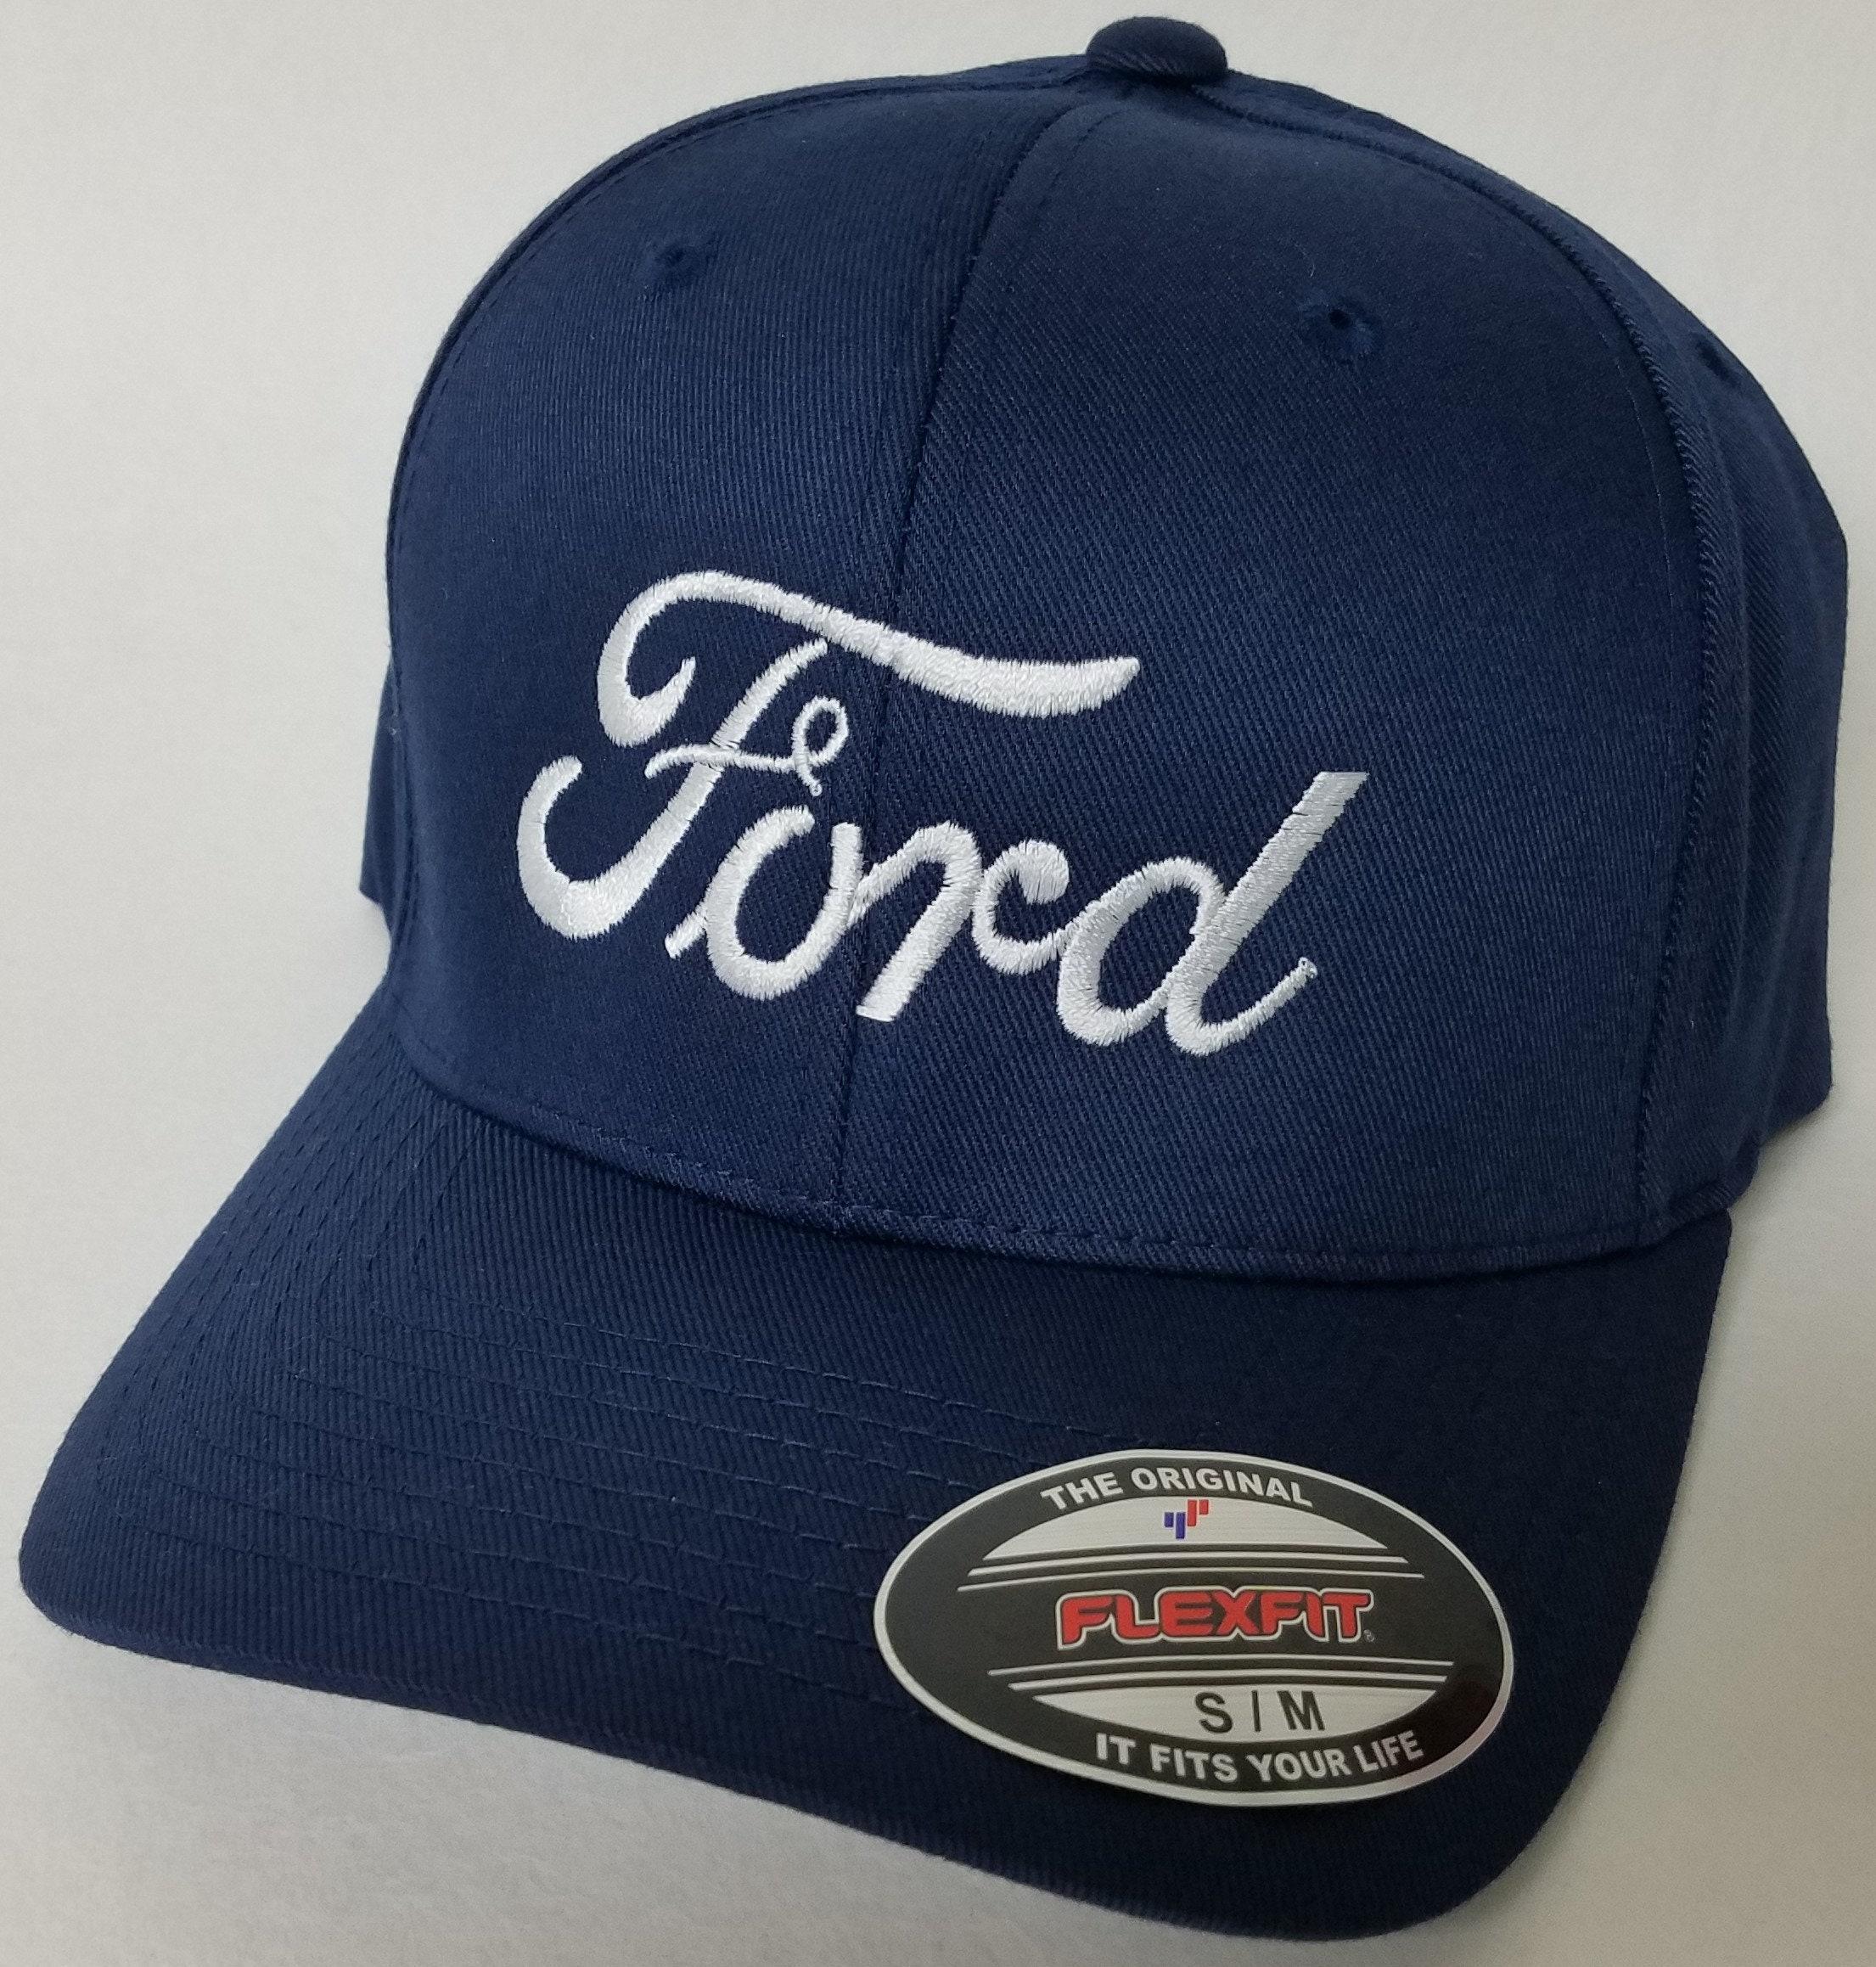 eb47634a8a3f4 FORD Embroidered FLEXFIT Baseball Hat   Flexfit Sty 6277